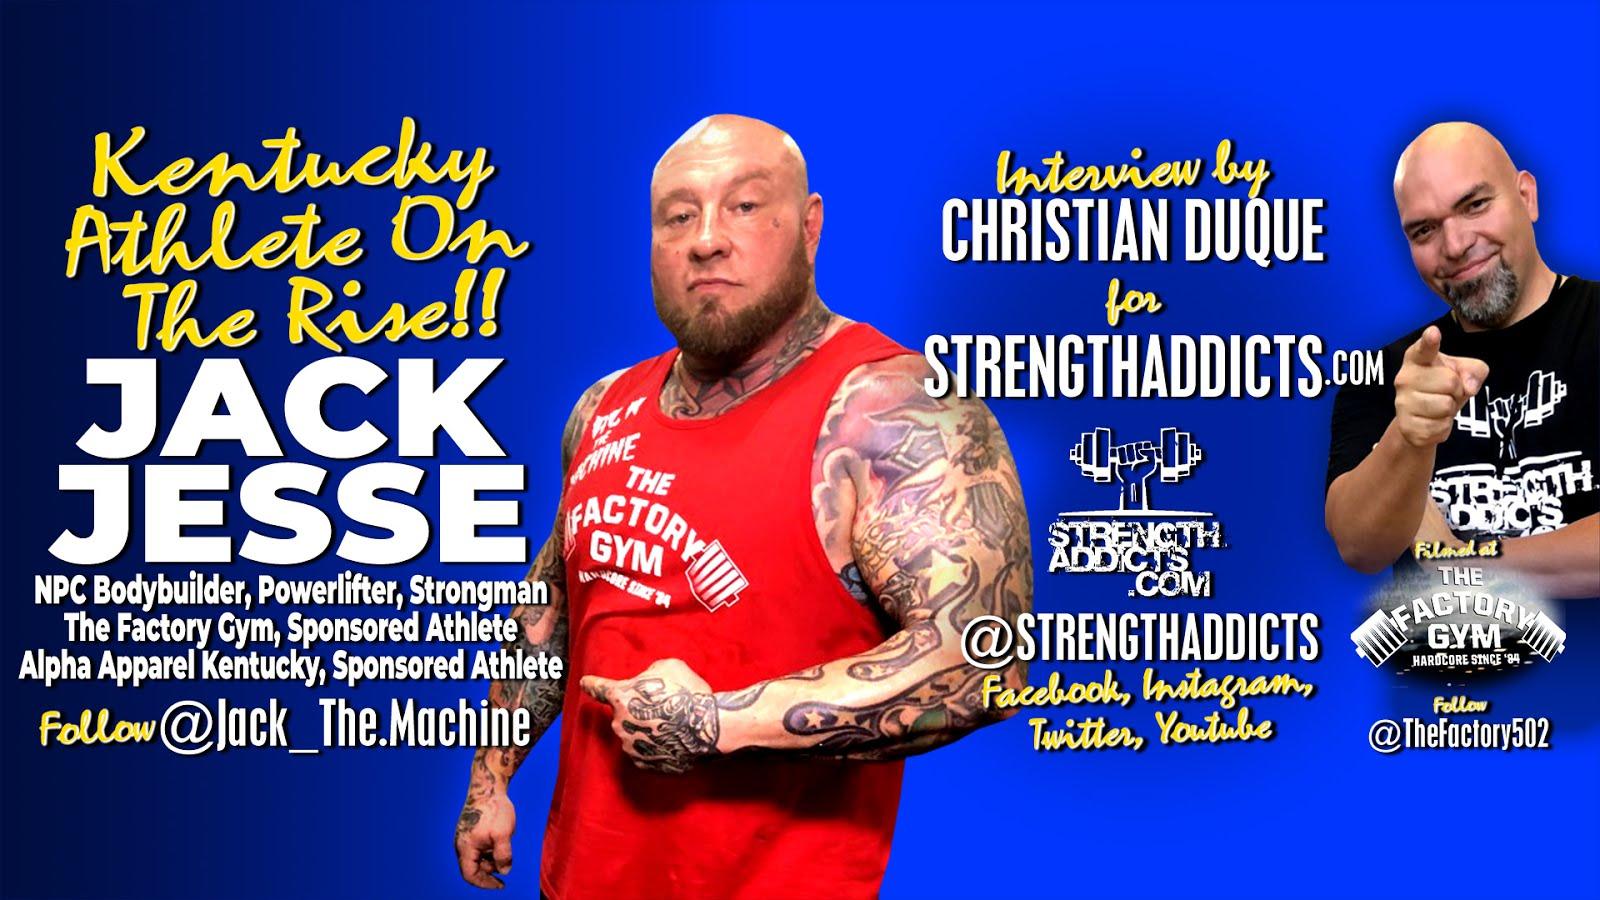 Jack Jesse - Strongman Champion